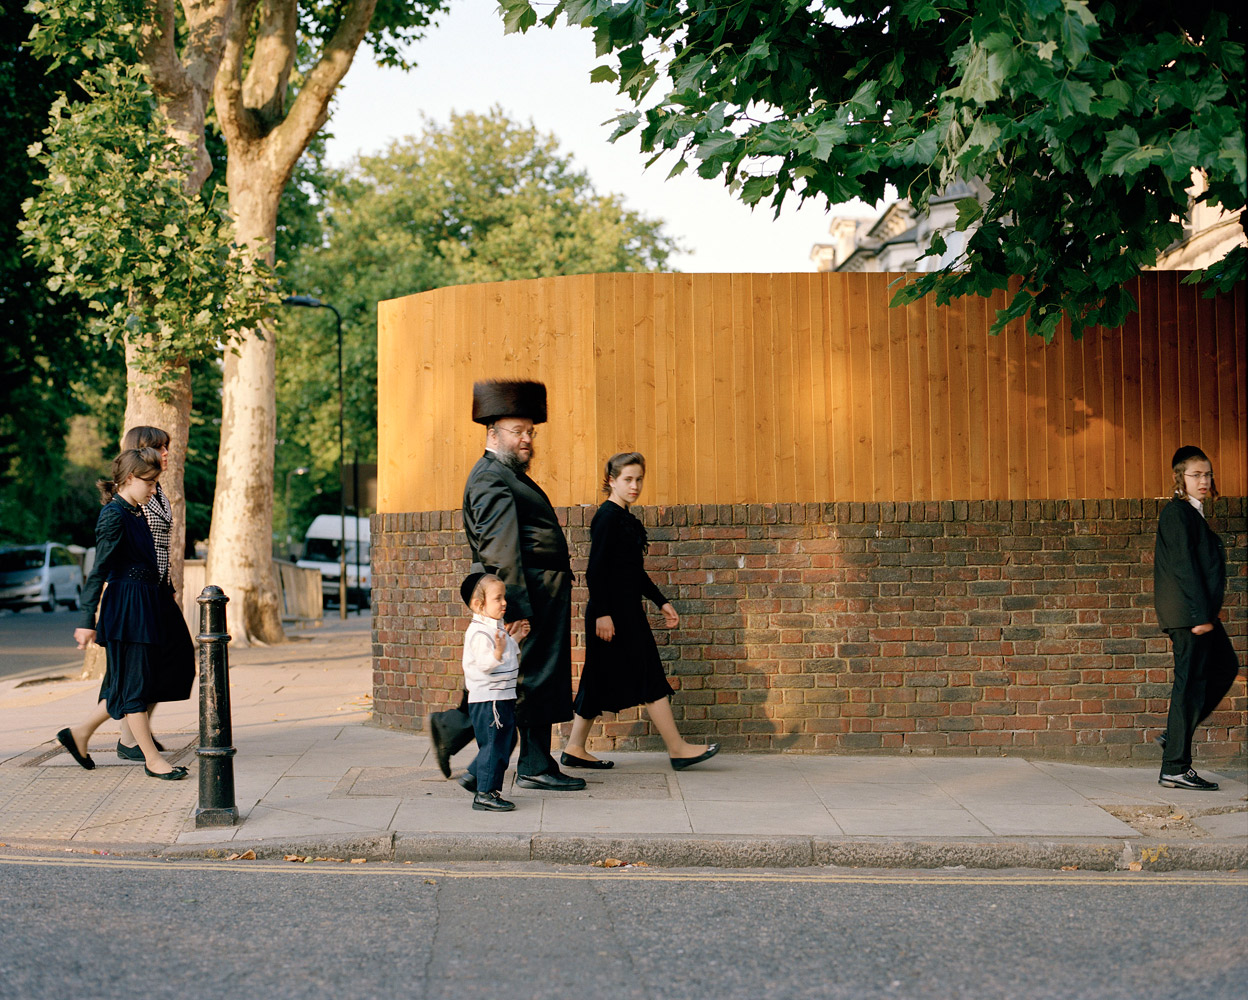 Orthodox Jews in Stoken Newington, Hackney. London. 2011